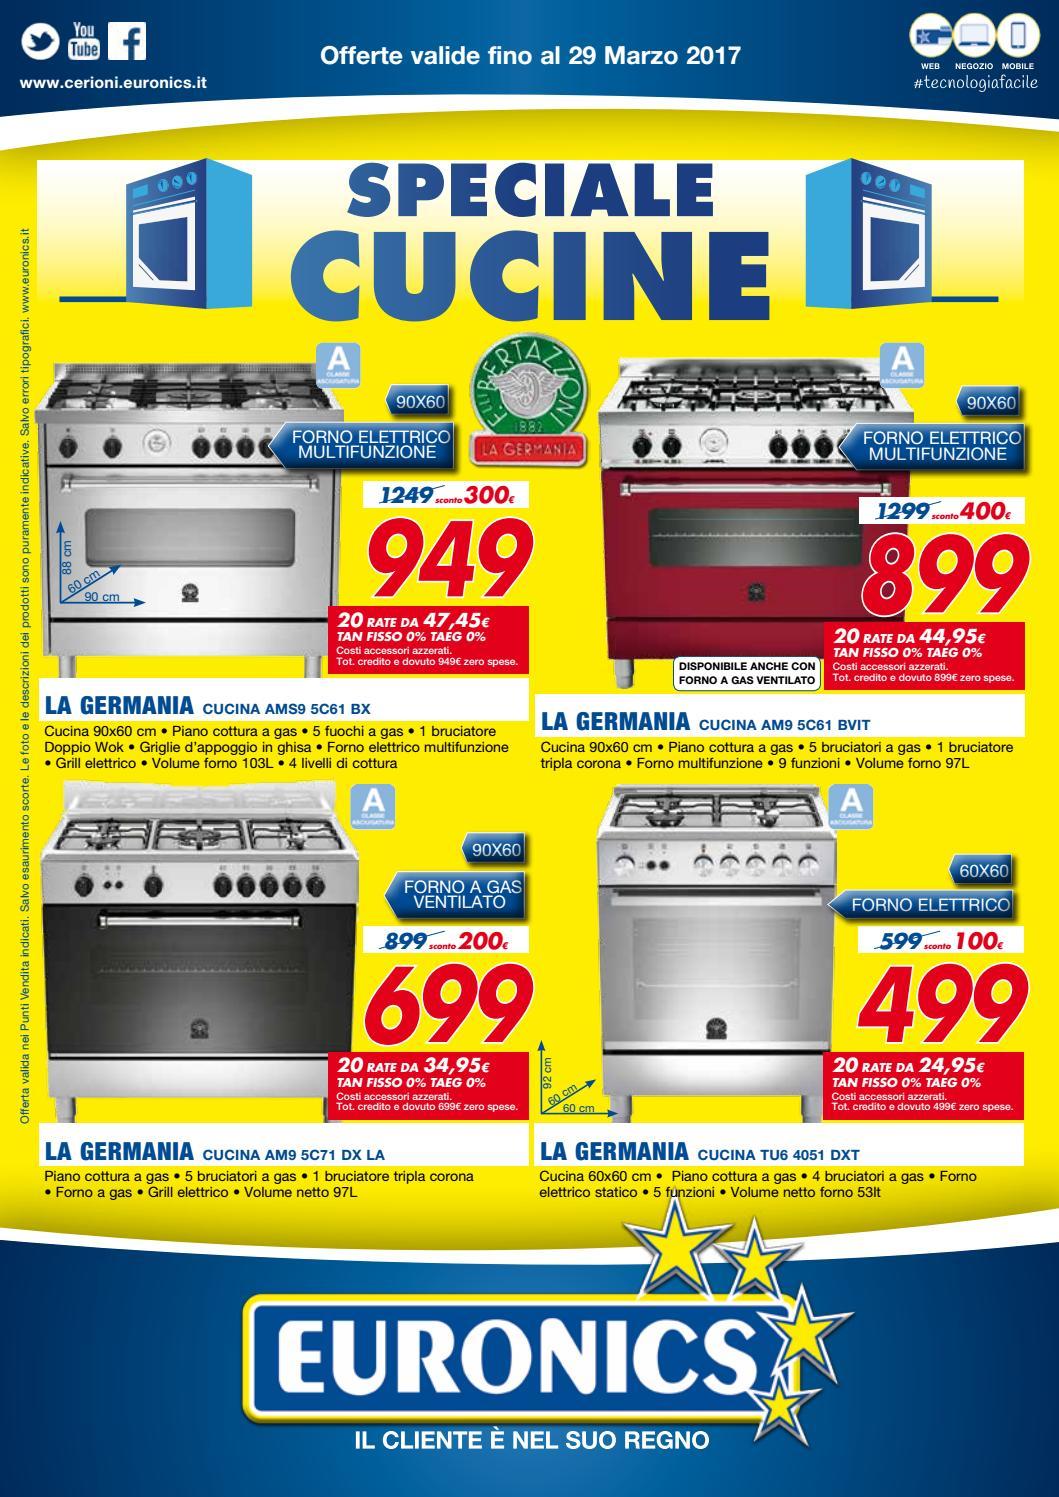 Cerioni speciale cucine by euronics italia spa - issuu